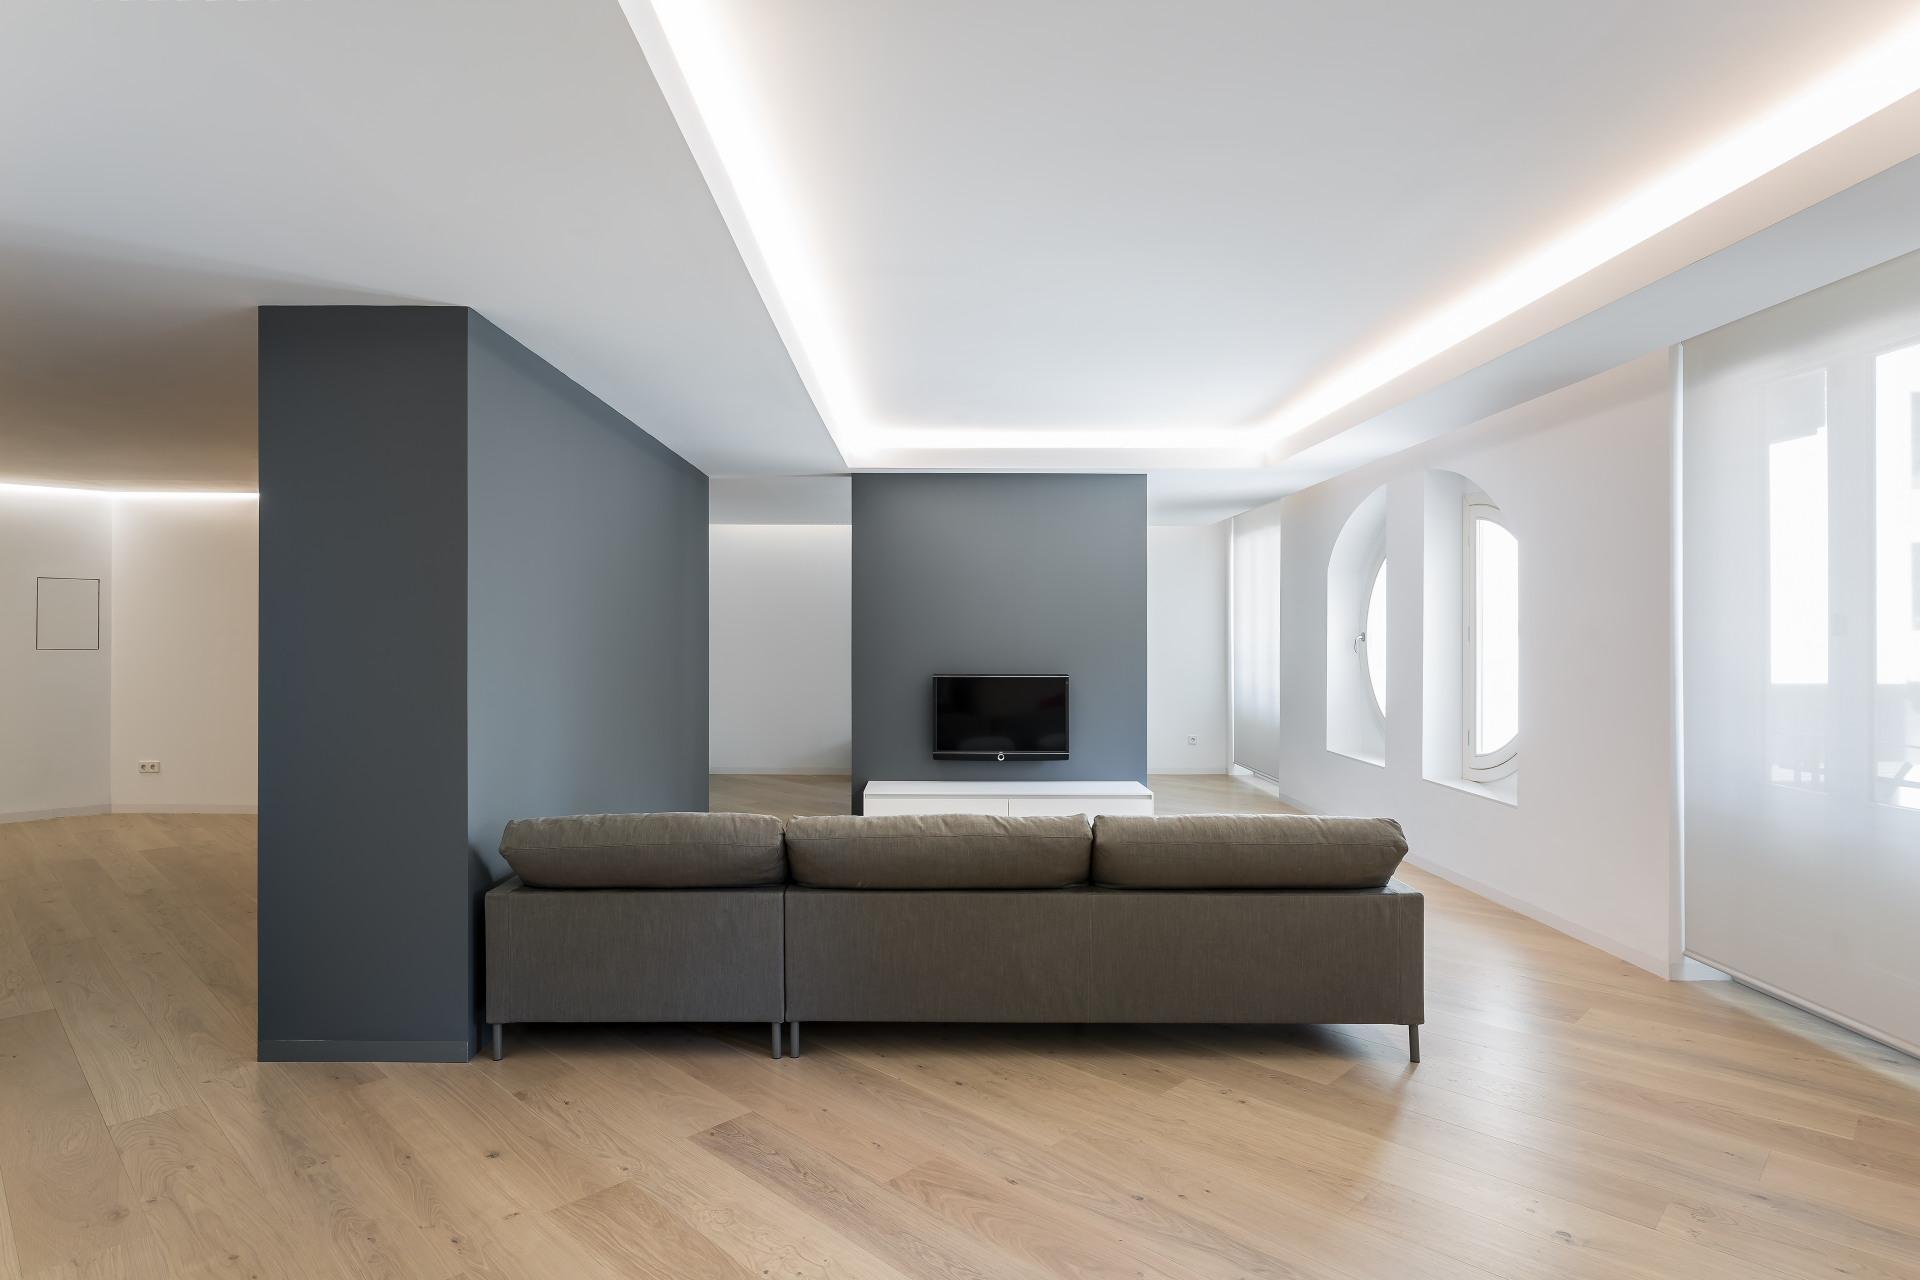 fotografia-arquitectura-interiorismo-valencia-german-cabo-gallardo-llopis-bfm-edificatoria-turia02 (13)